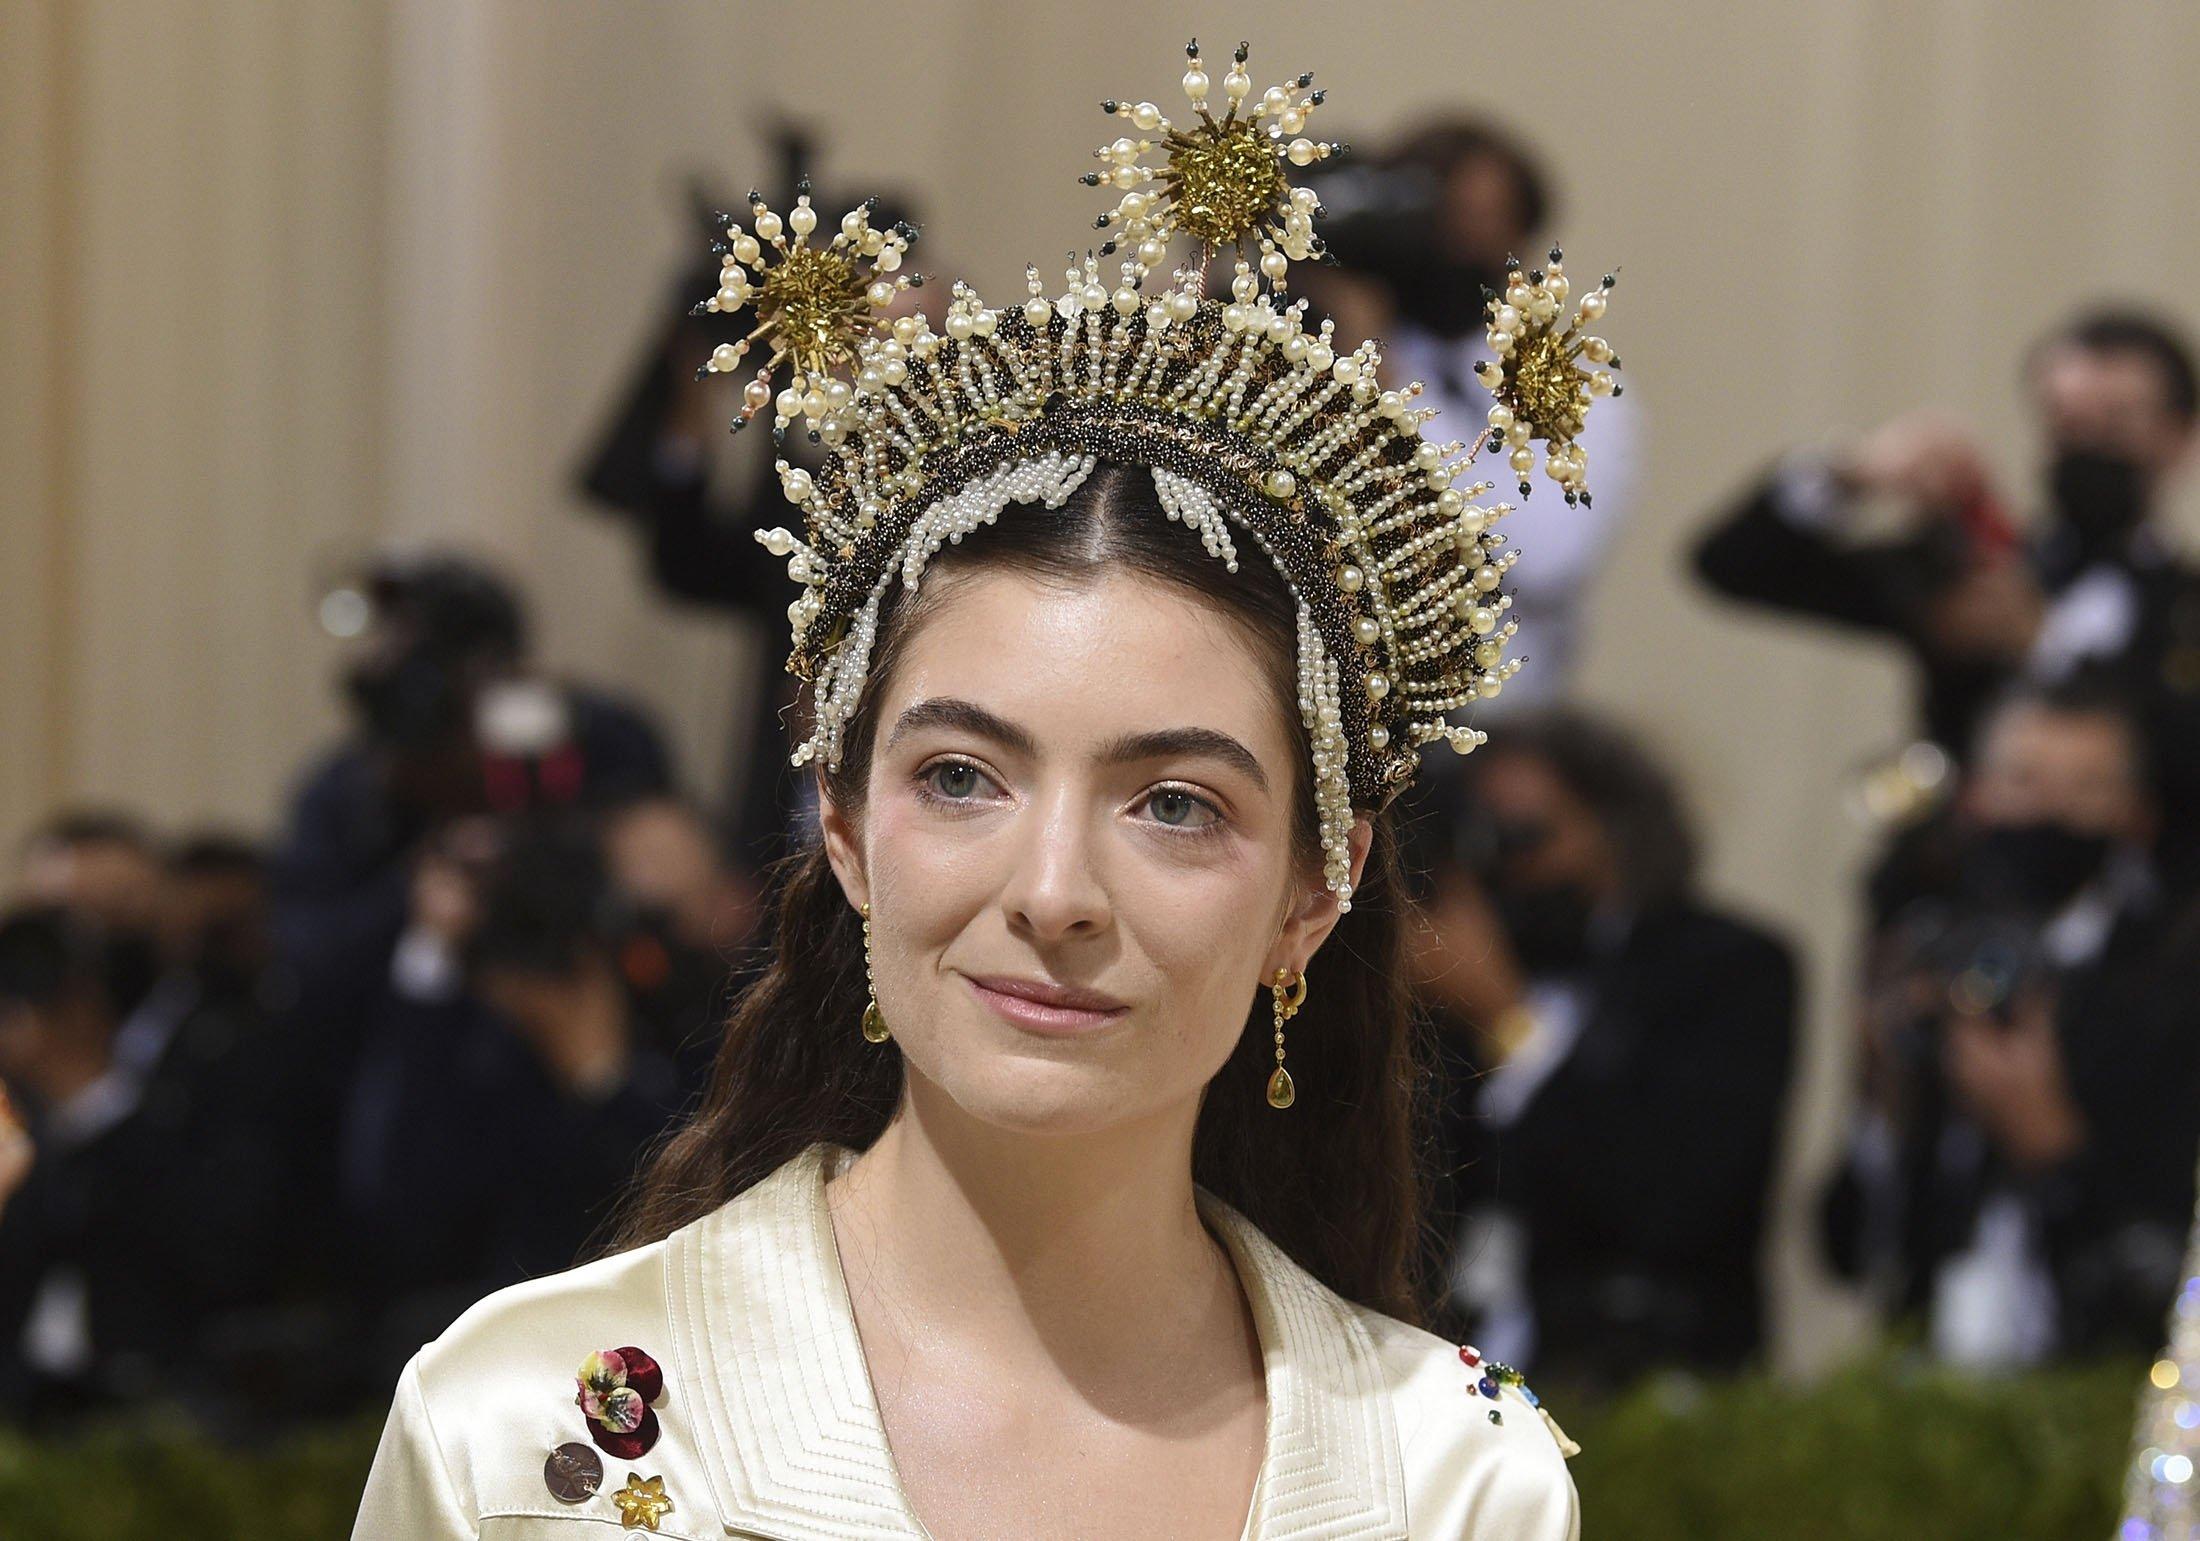 Lorde arrives for the 2021 Met Gala at the Metropolitan Museum of Art, in New York, U.S., Sept. 13, 2021. (AP Photo)